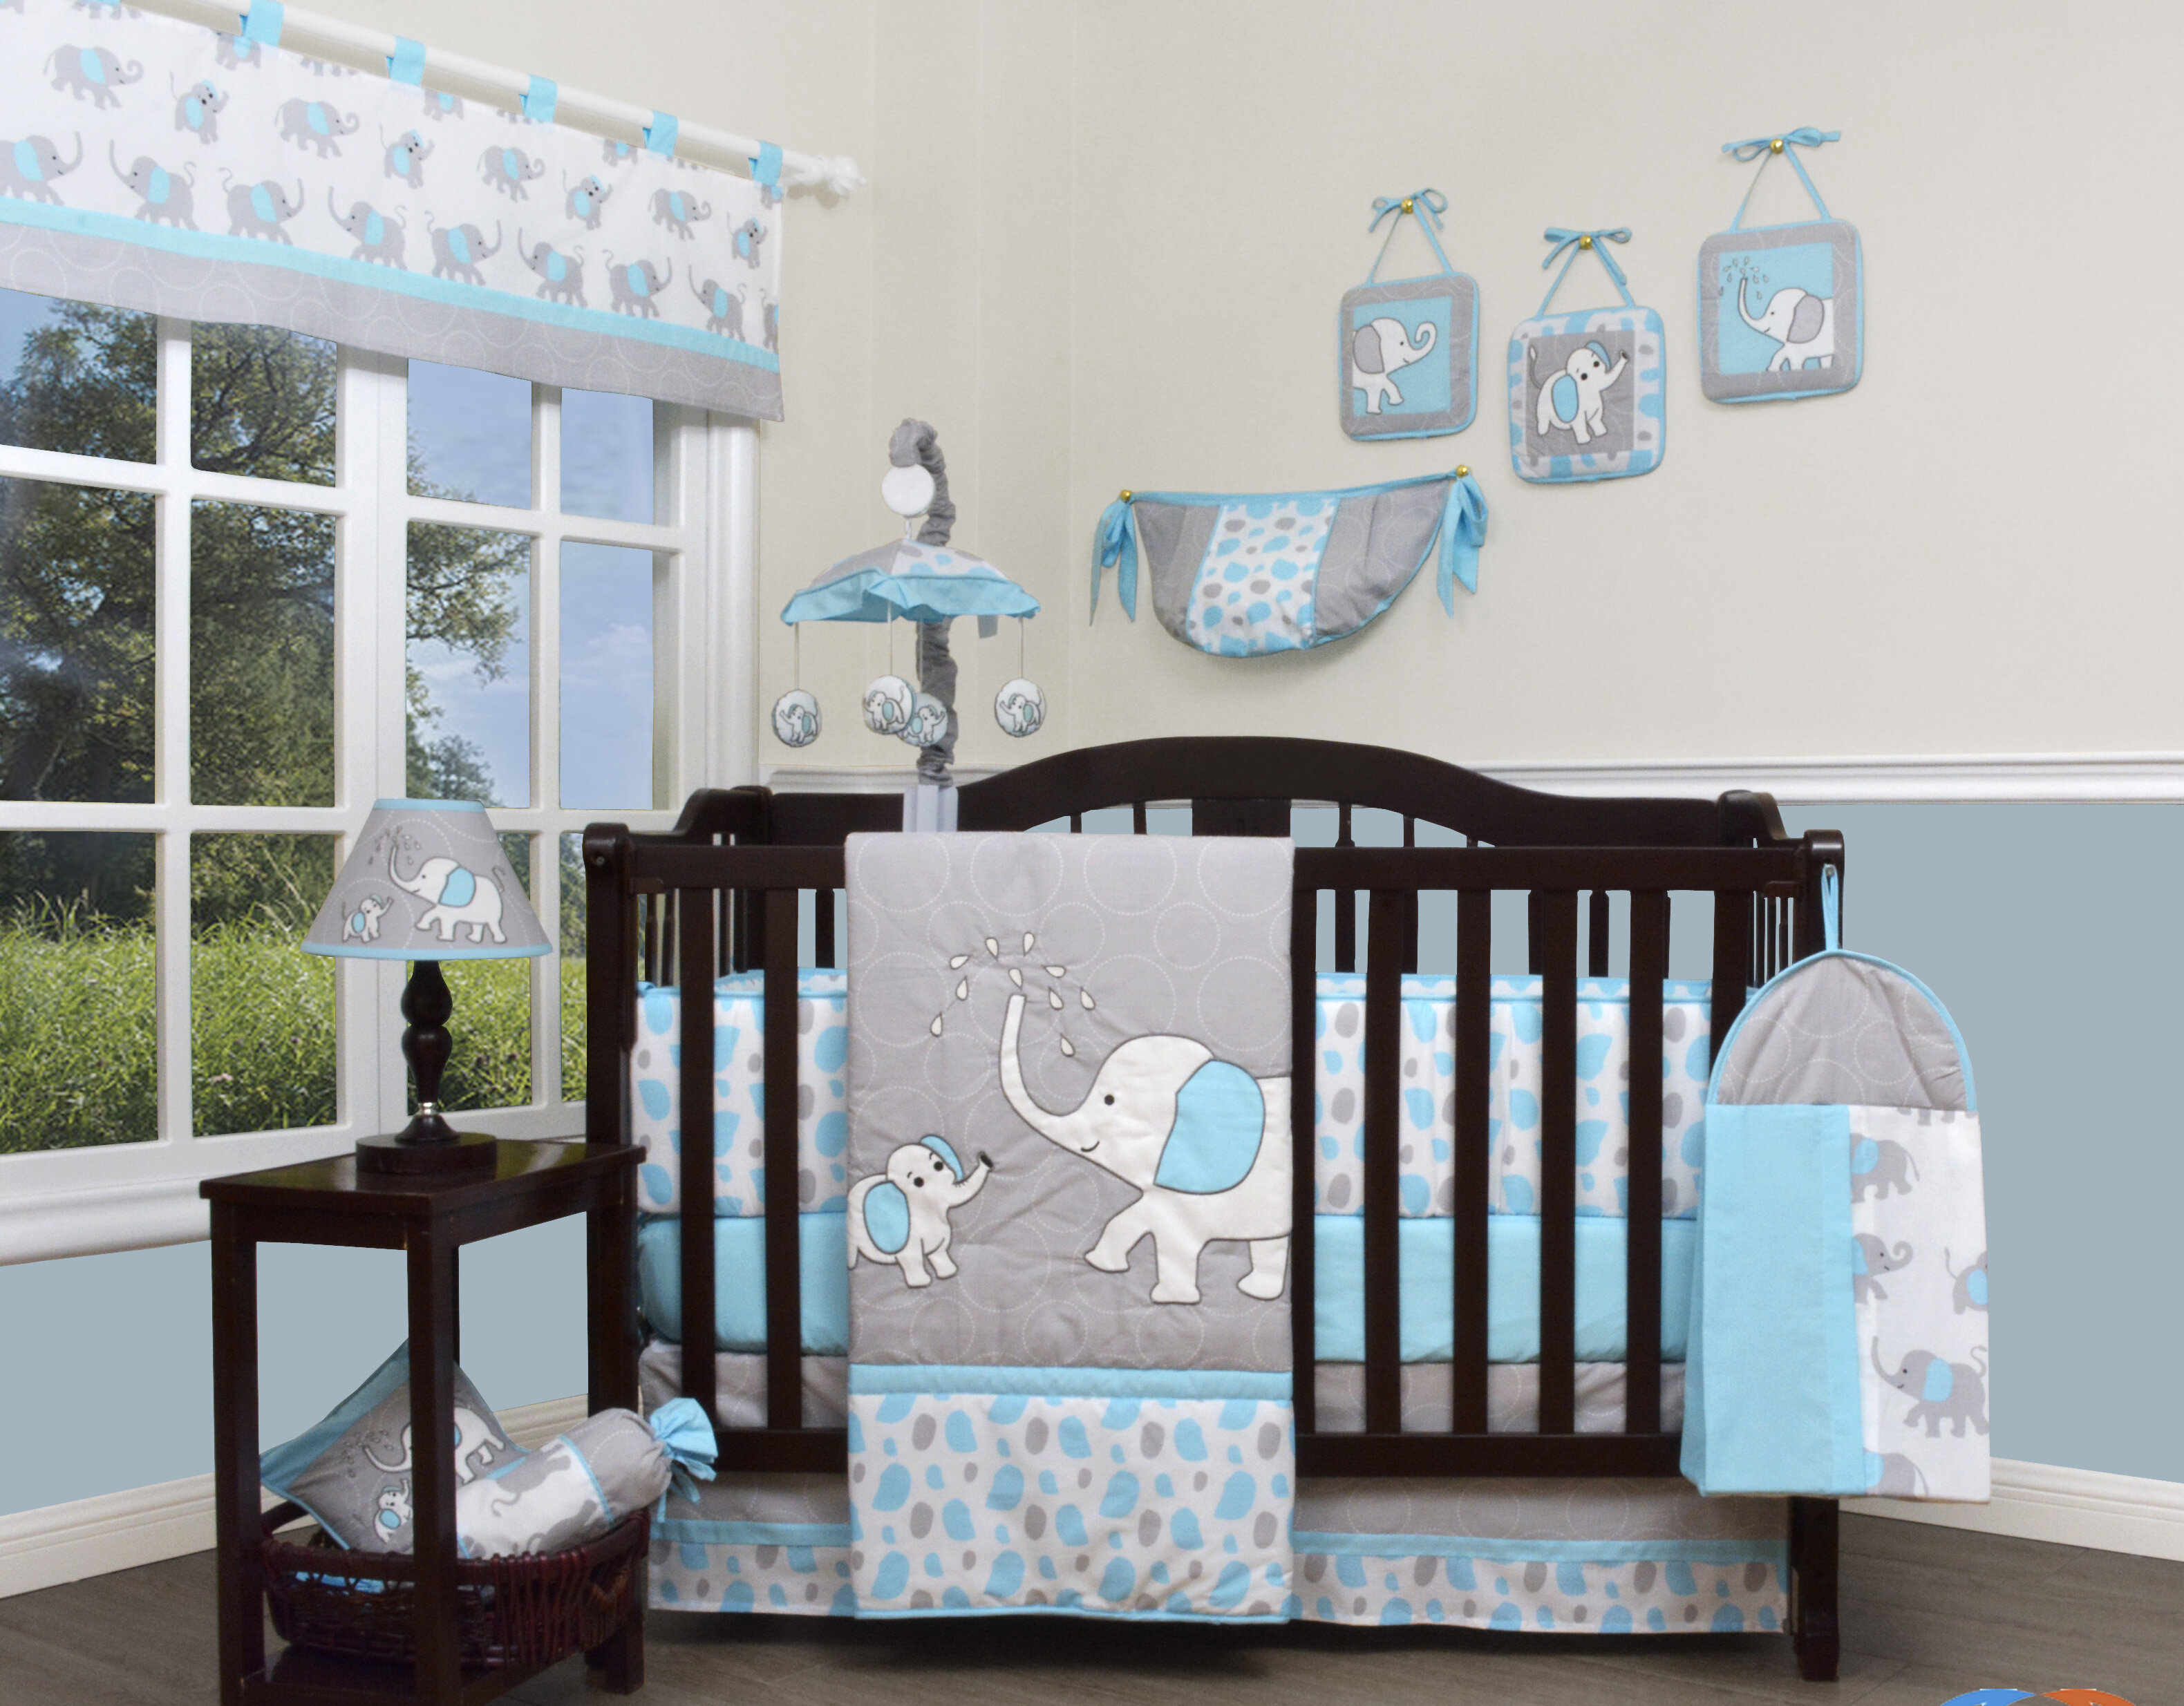 Baby Boys Elephant Jungle Diego Aqua Nursery Crib Bedding Set 5 Pcs FREE Blanket